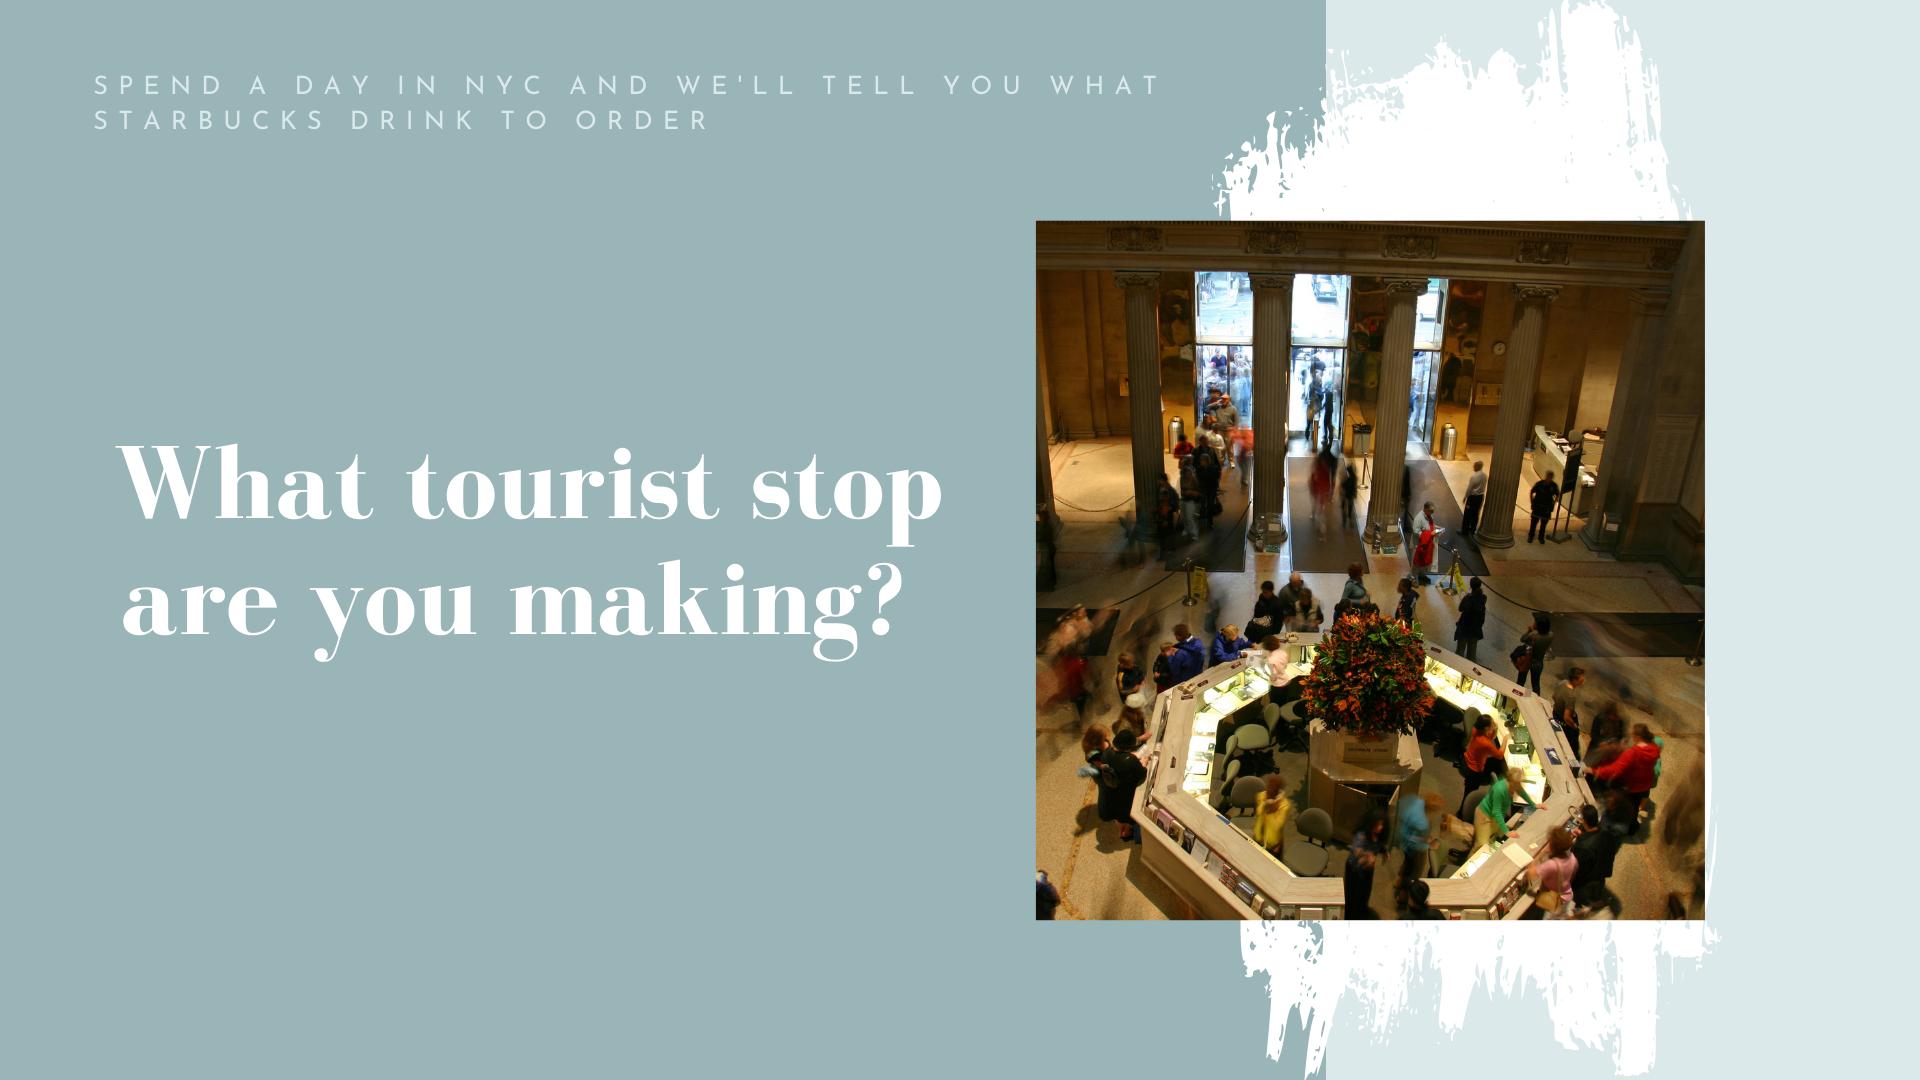 tourist stop